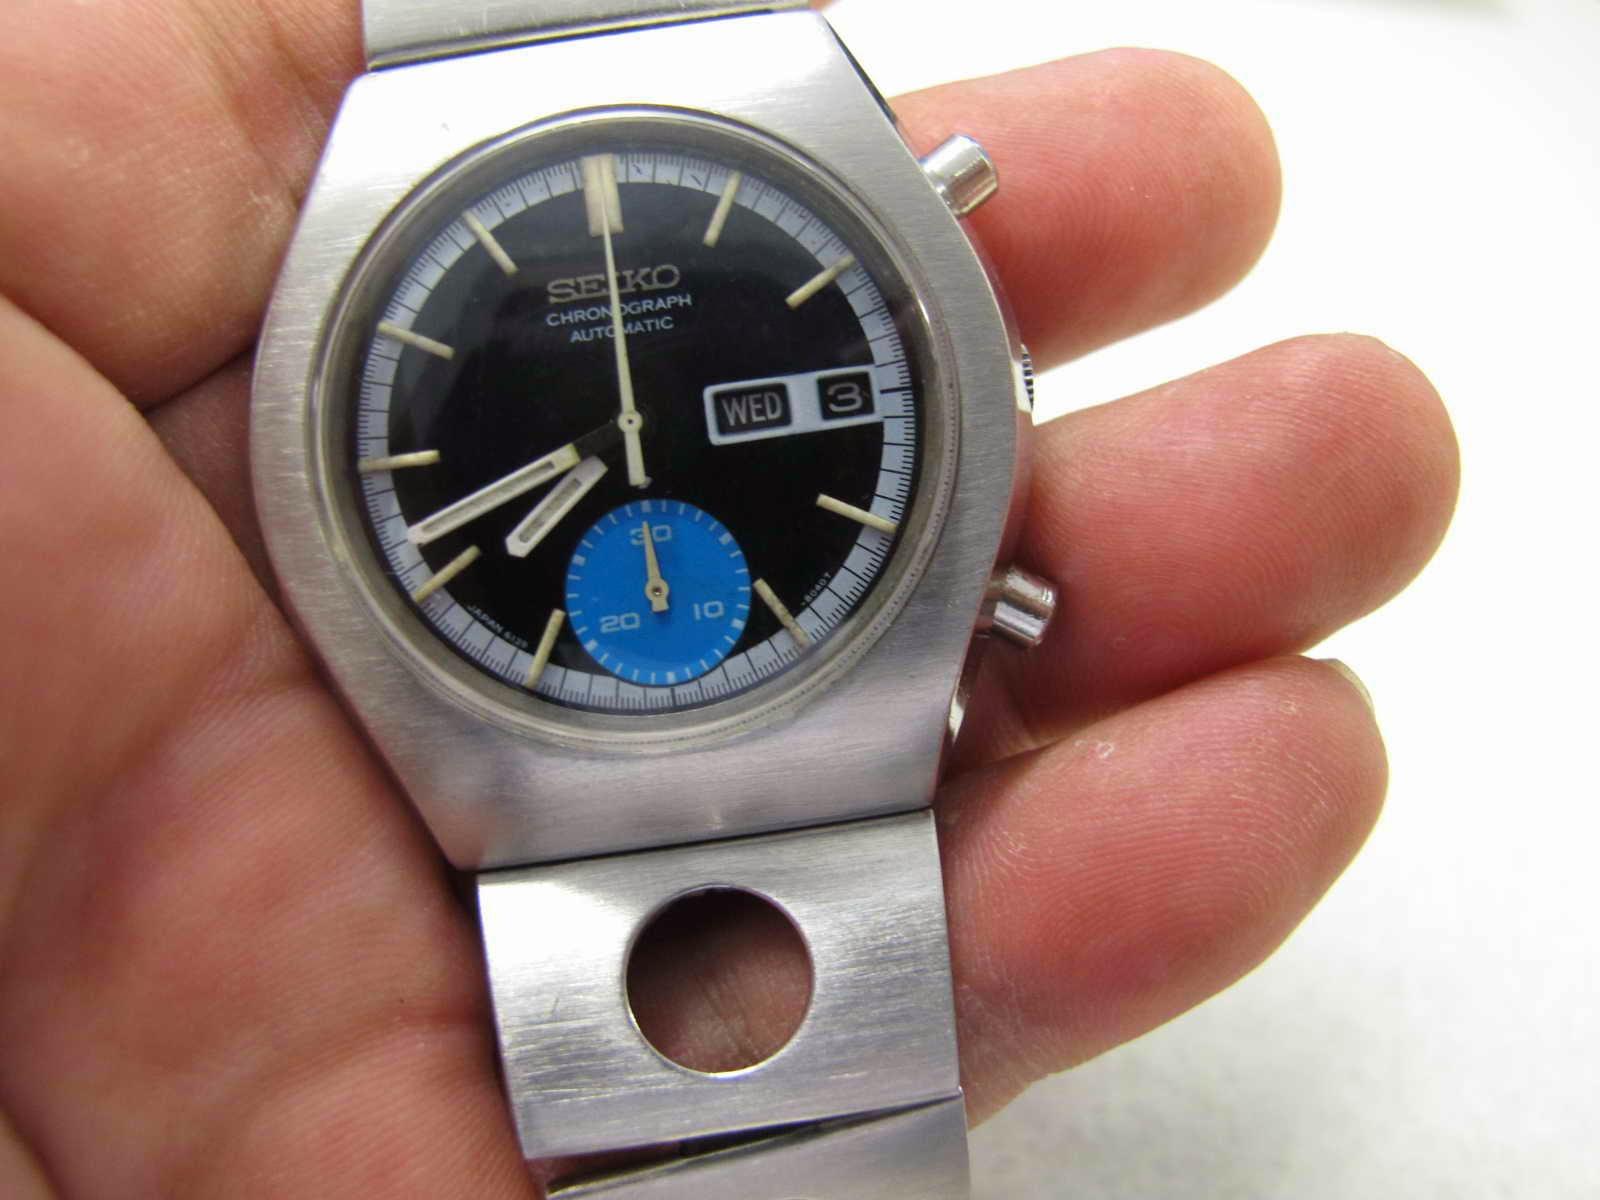 Maximuswatches Jual Beli Jam Tangan Second-Baru Original-Koleksi Jam ... 9356fc26ee